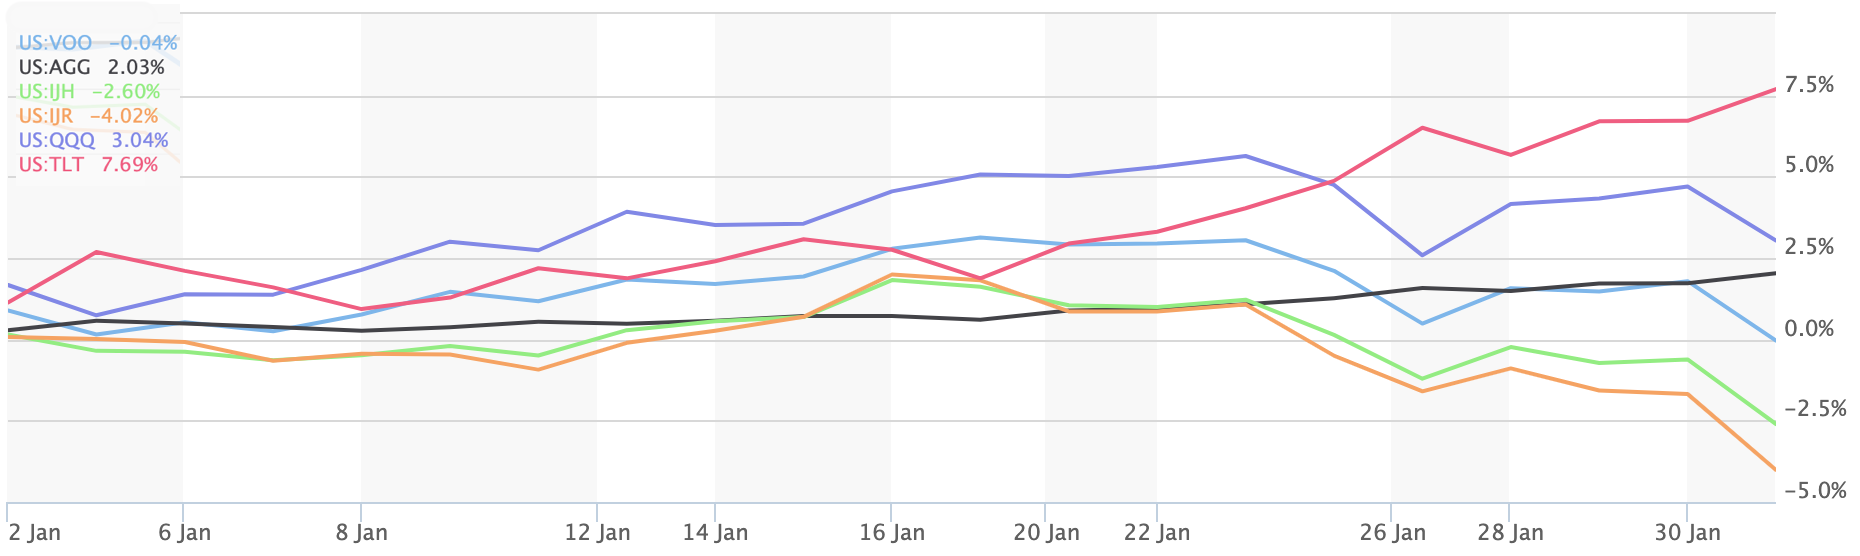 The S&P 500 (VOO) vs other popular index ETFs